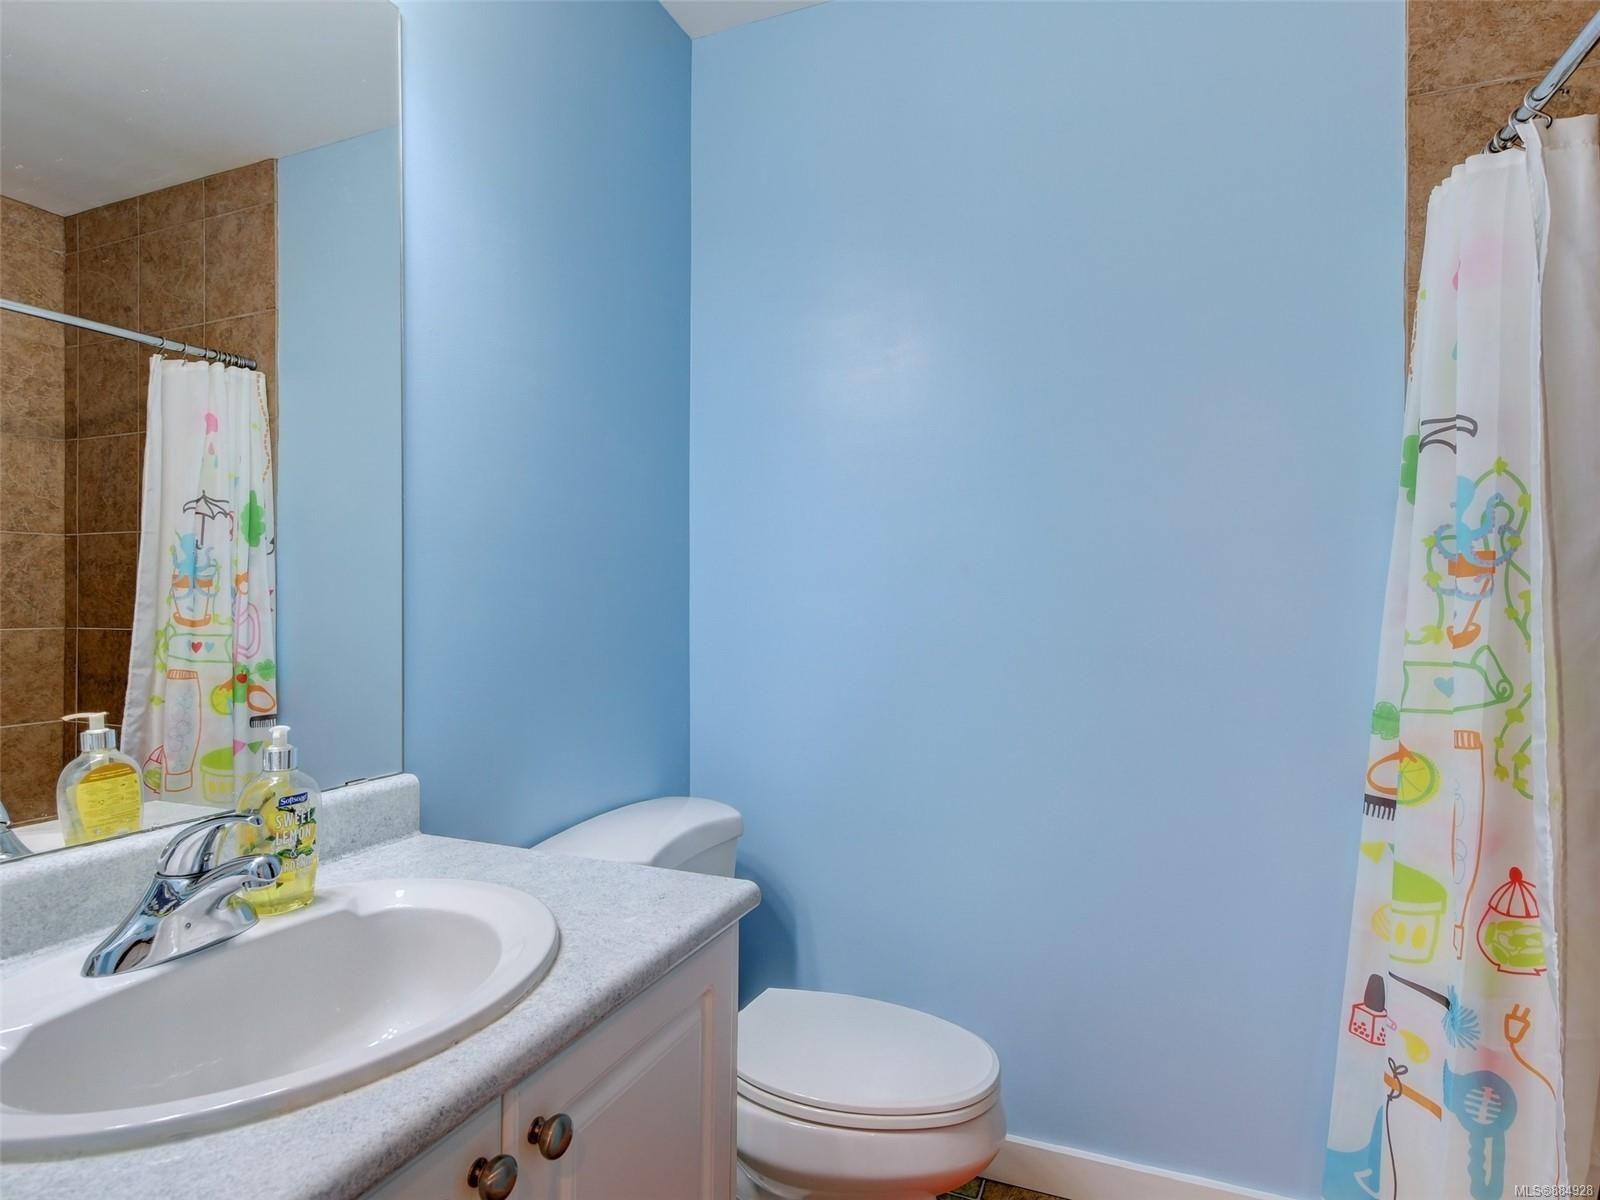 Photo 17: Photos: 6896 Beaton Rd in : Sk Broomhill Half Duplex for sale (Sooke)  : MLS®# 884928